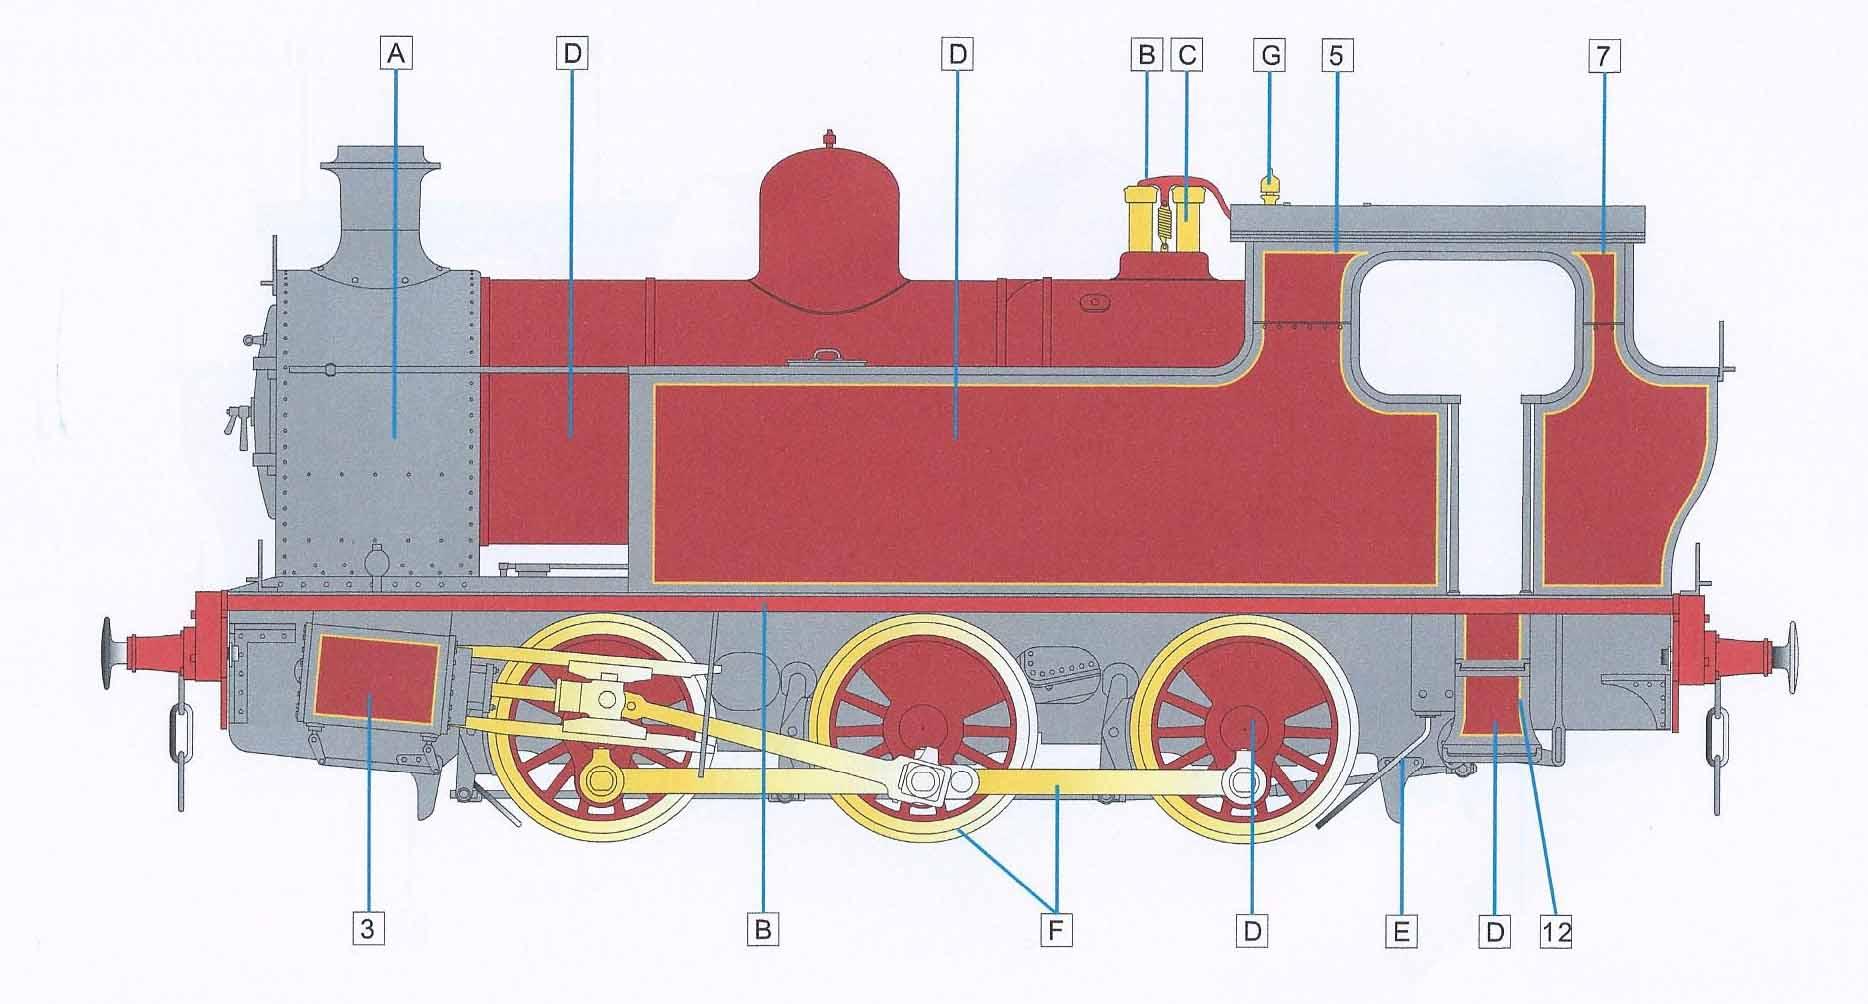 MOS-VLRL Left profile